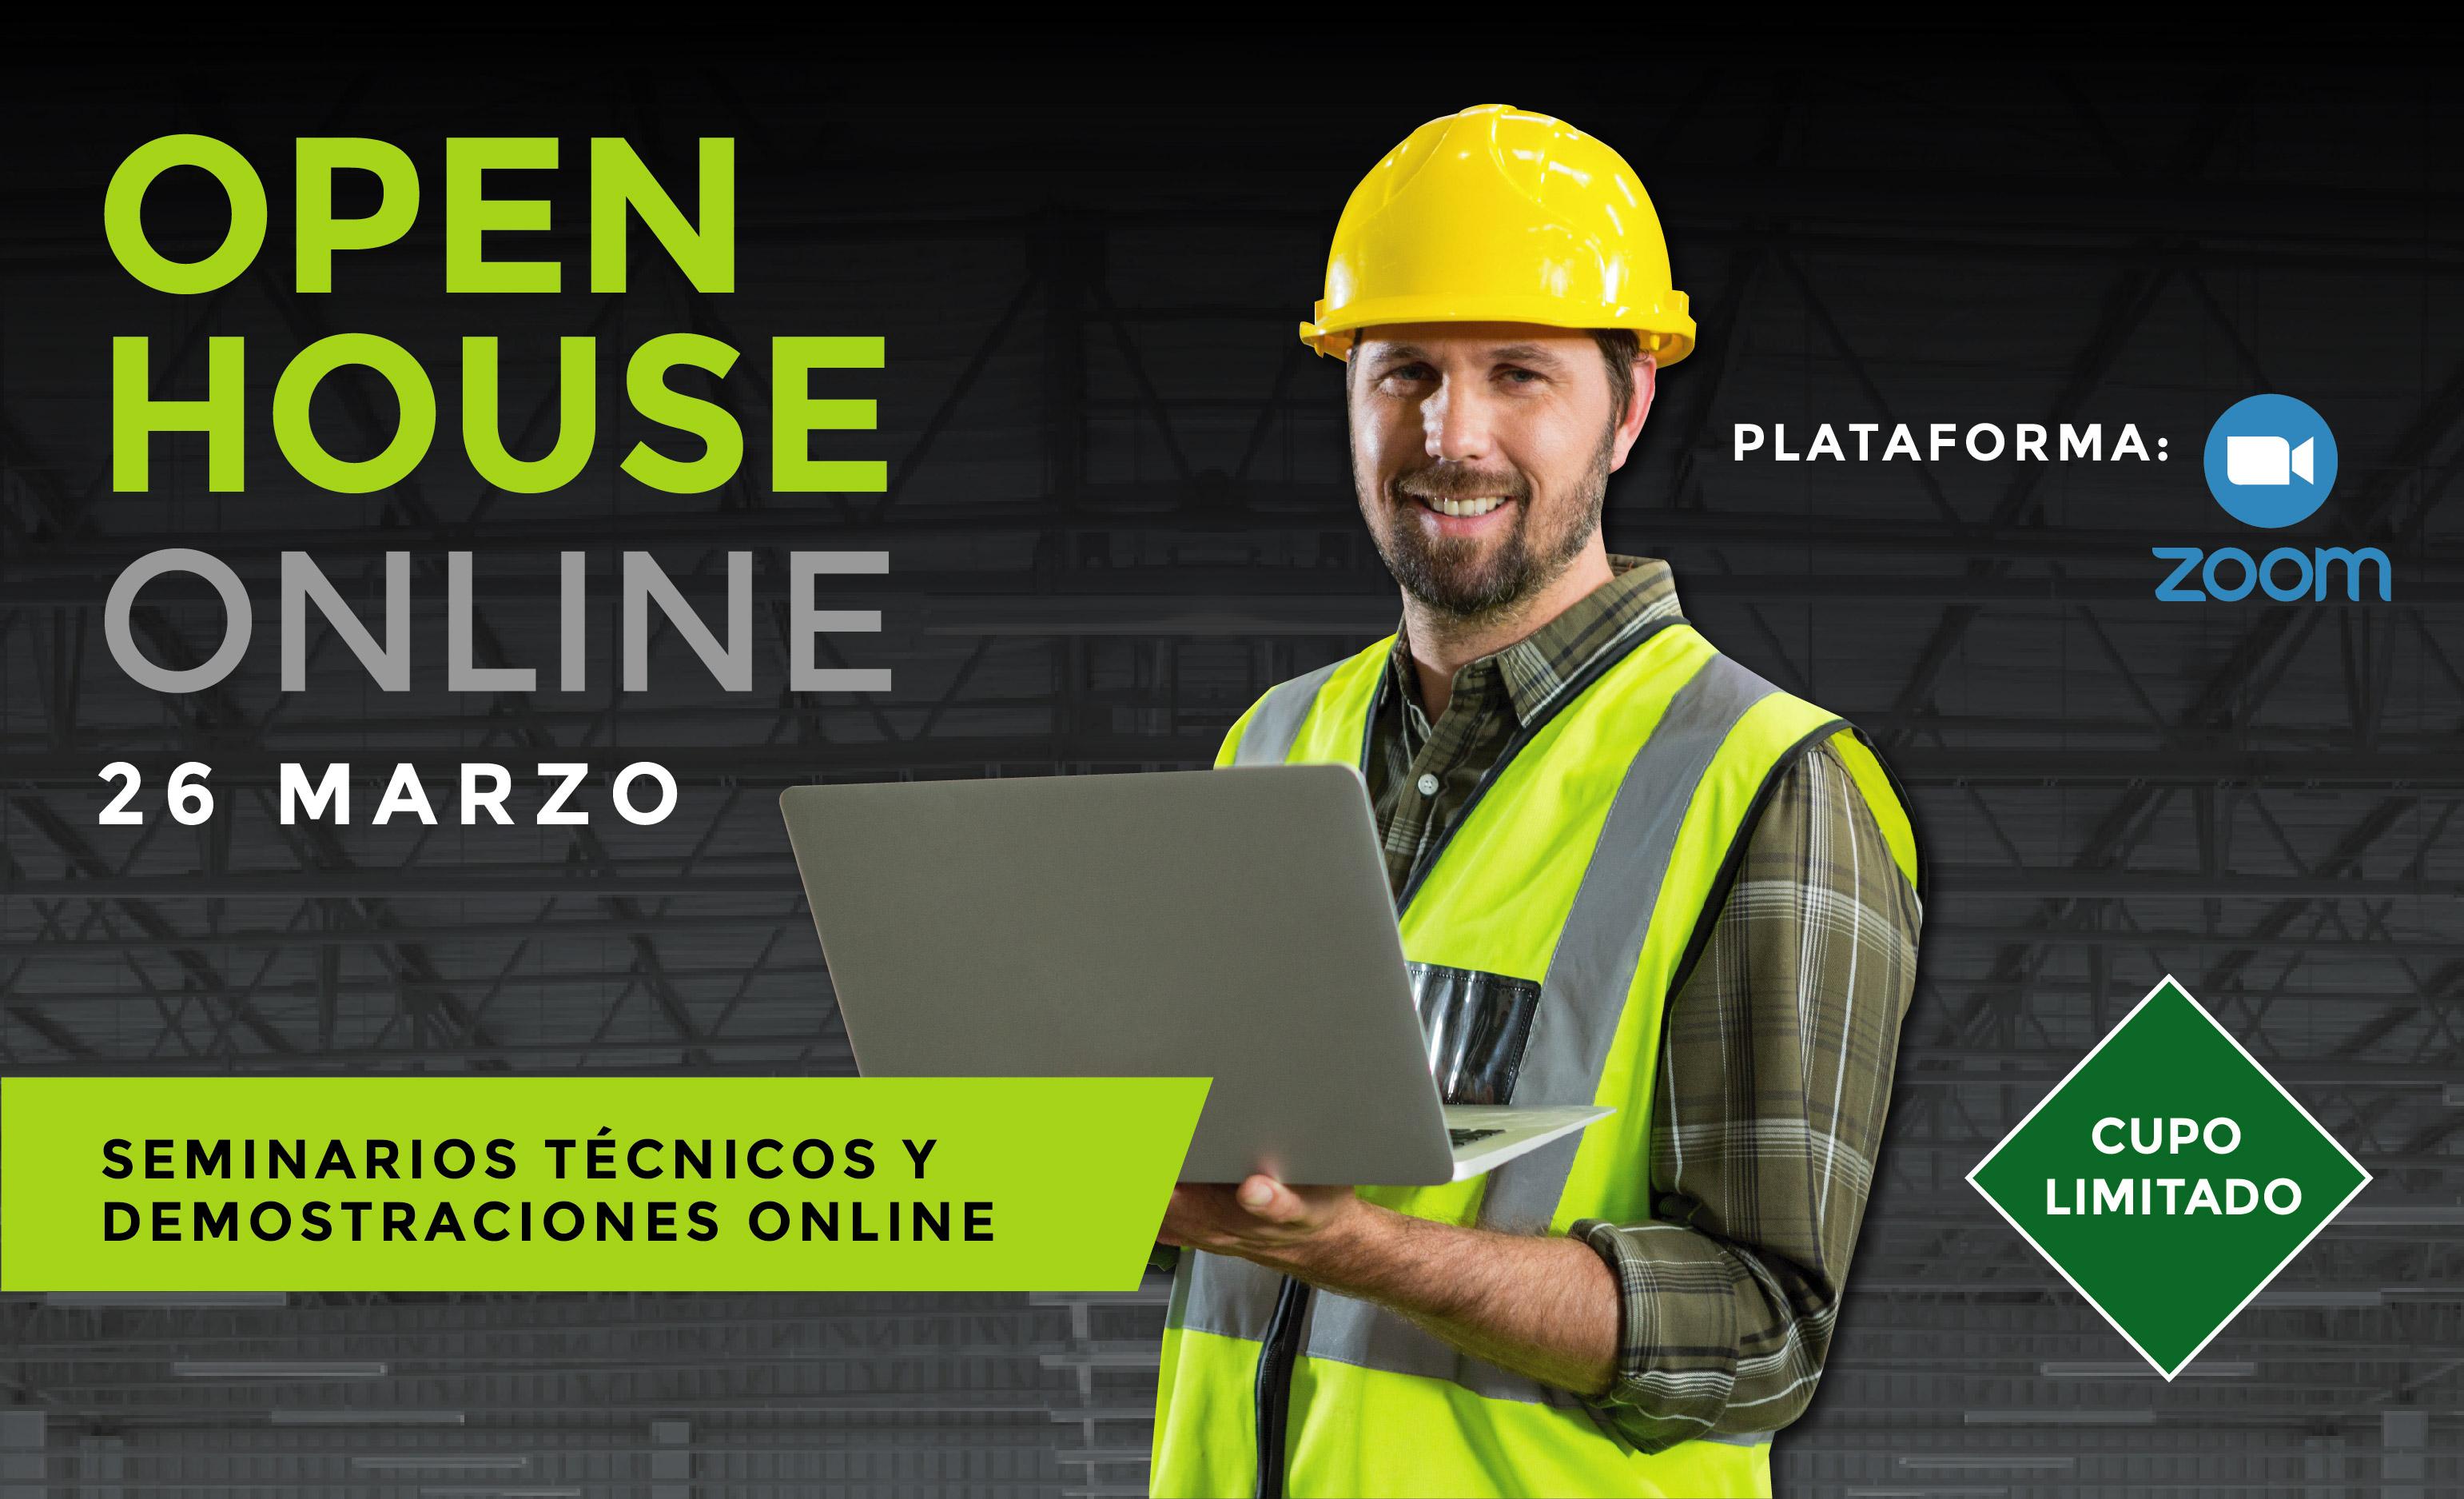 OPEN HOUSE ONLINE - 26 MARZO 2021